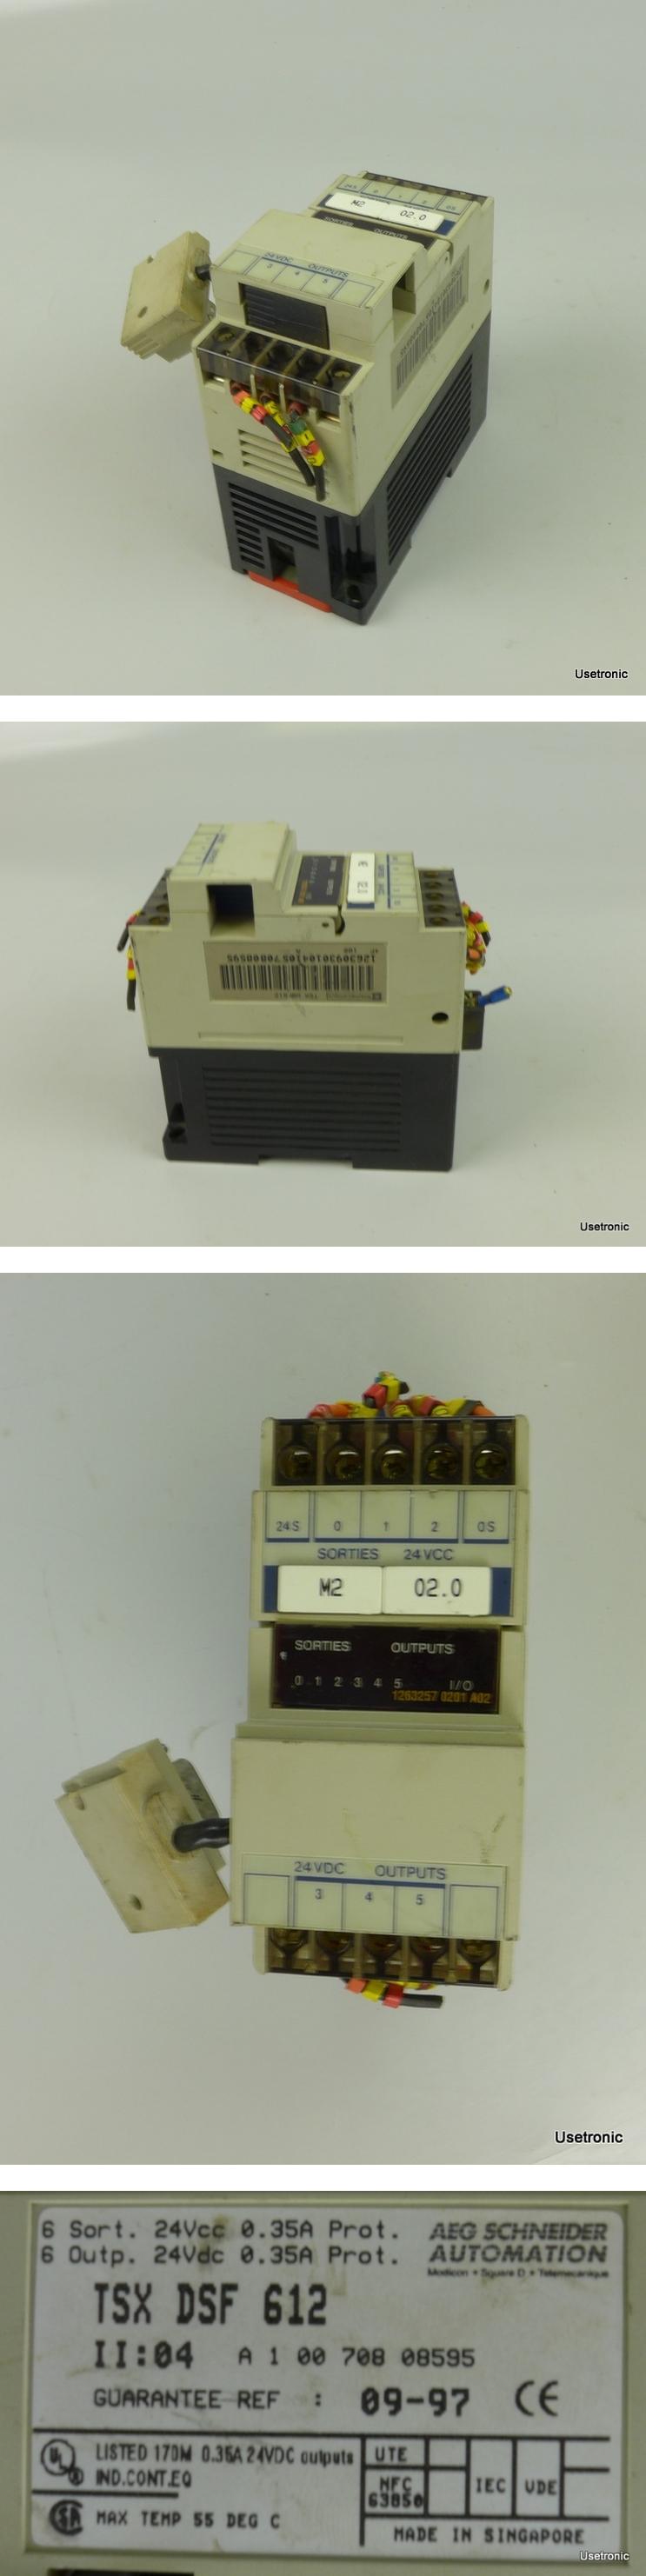 Telemecanique TSXDSF612